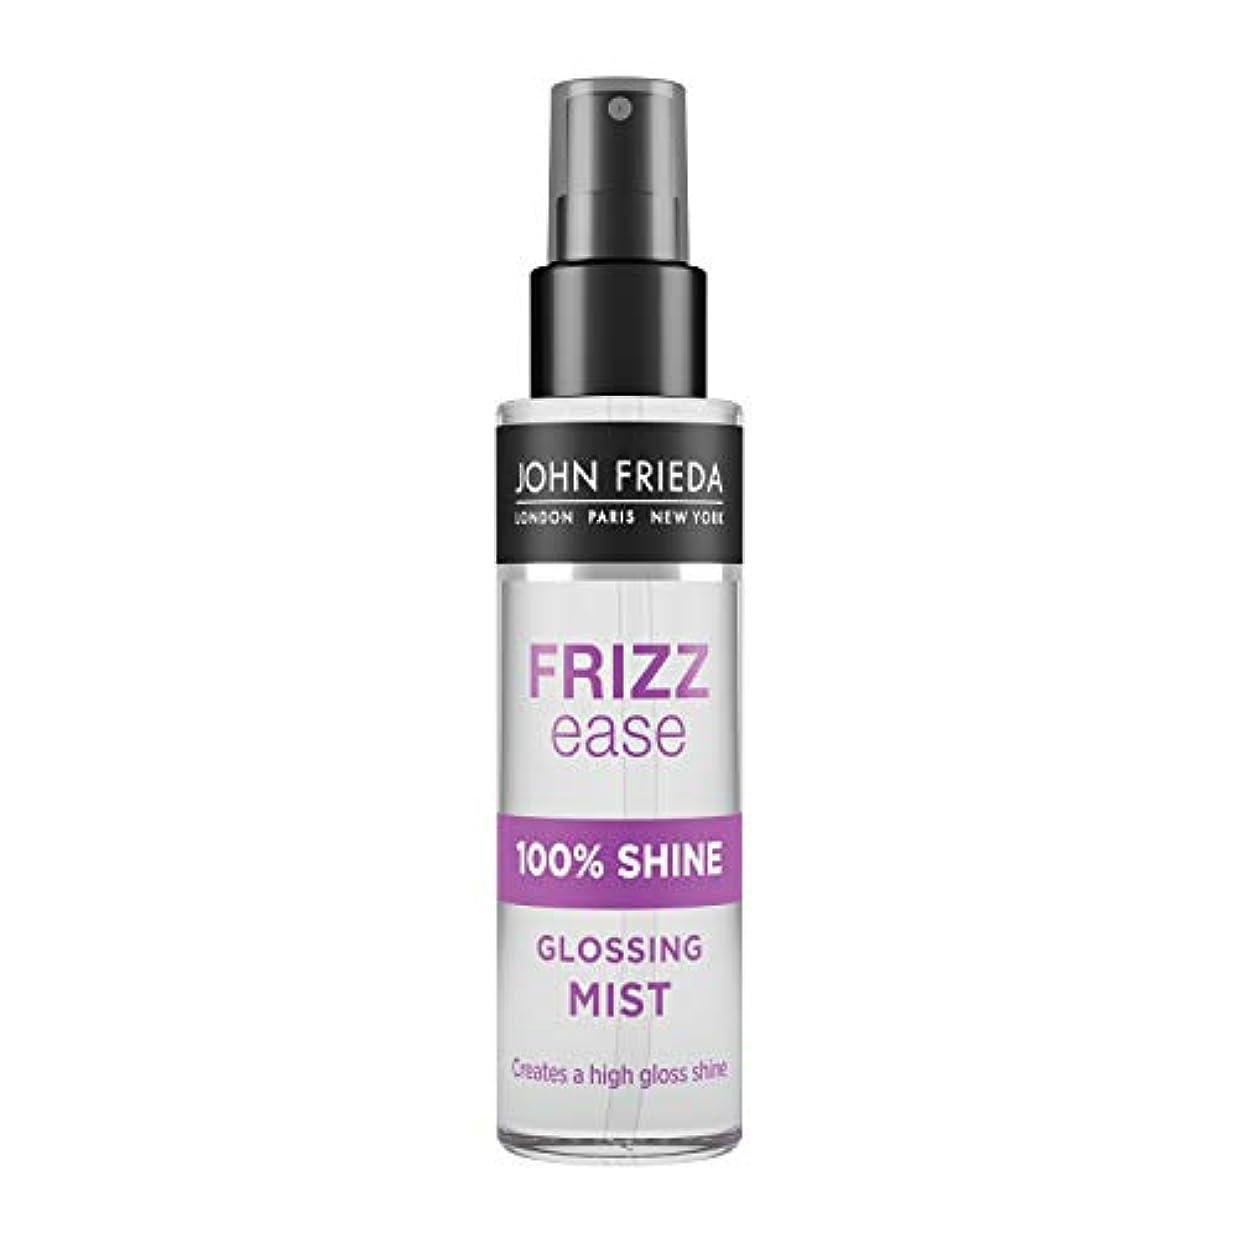 不承認信頼底John Frieda Frizz Ease 100% Shine Glossing Mist 75ml